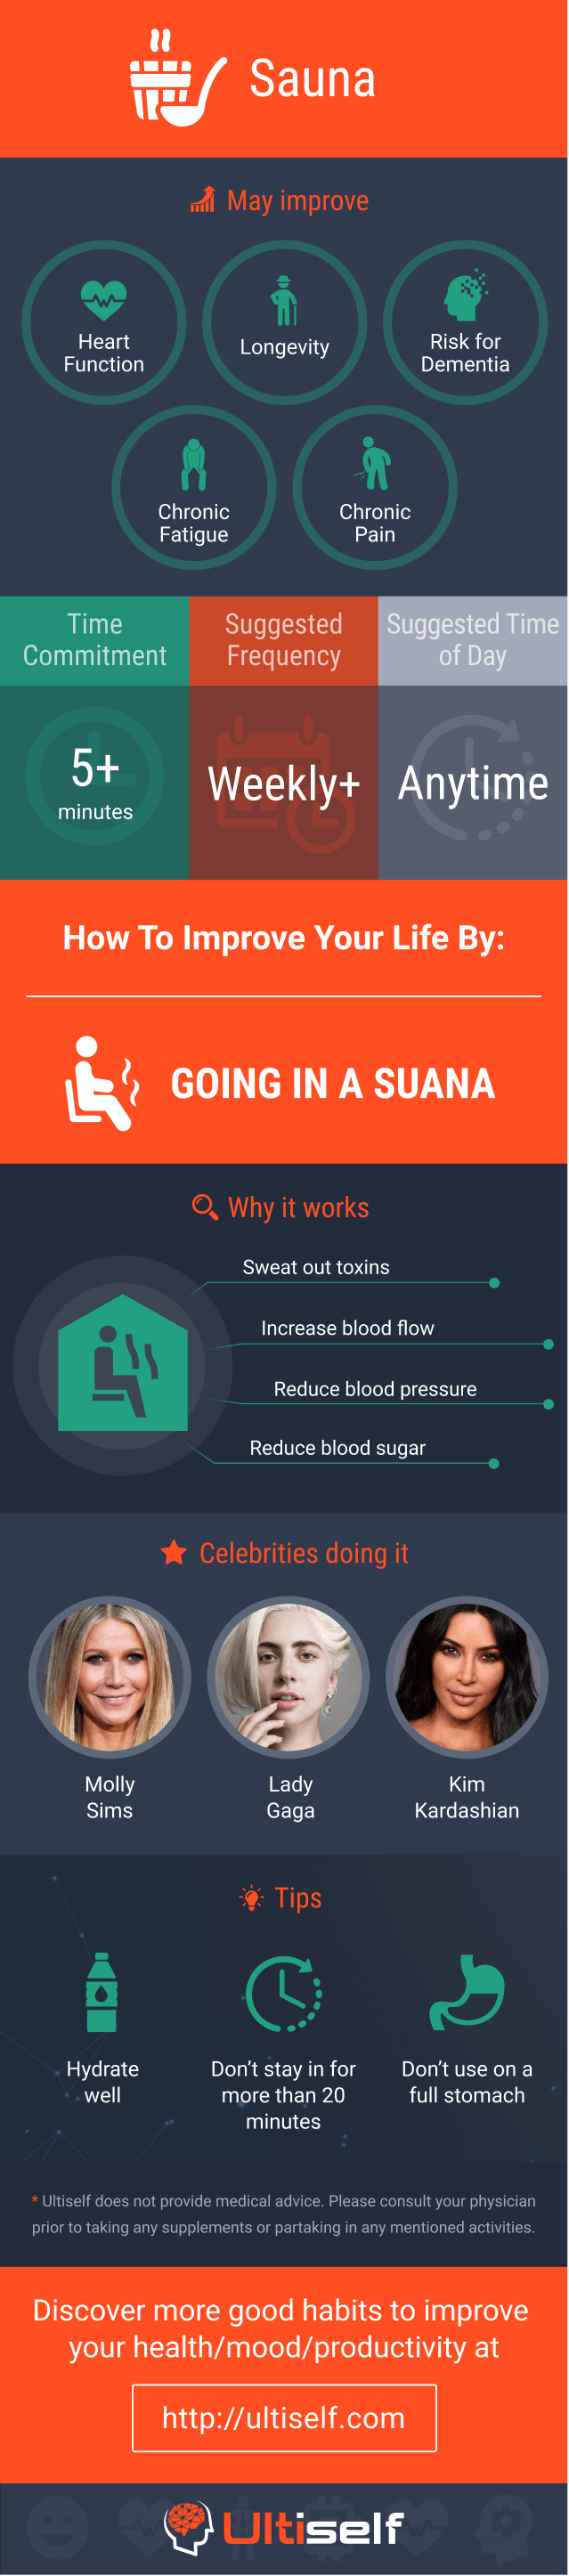 Sauna infographic